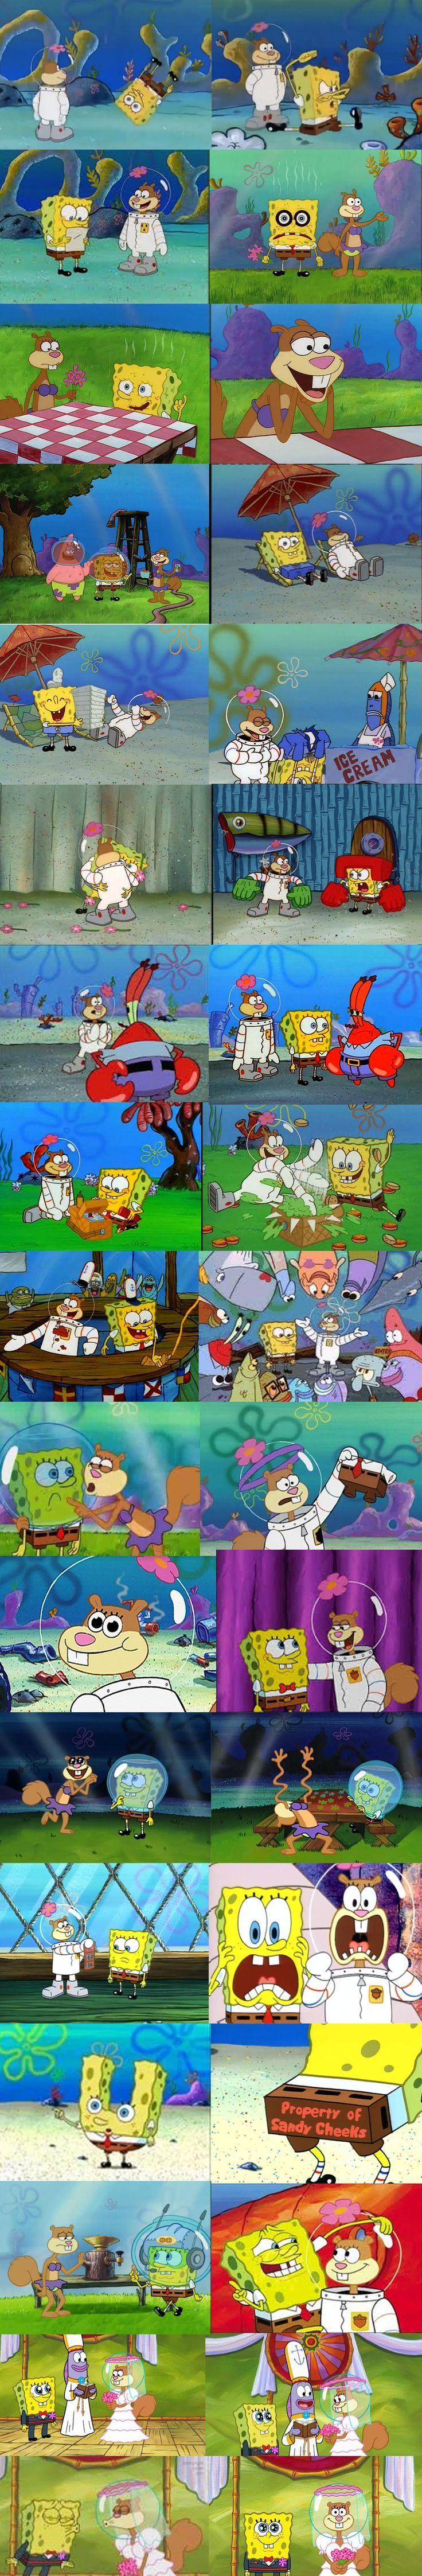 Spongebob and Sandy lol